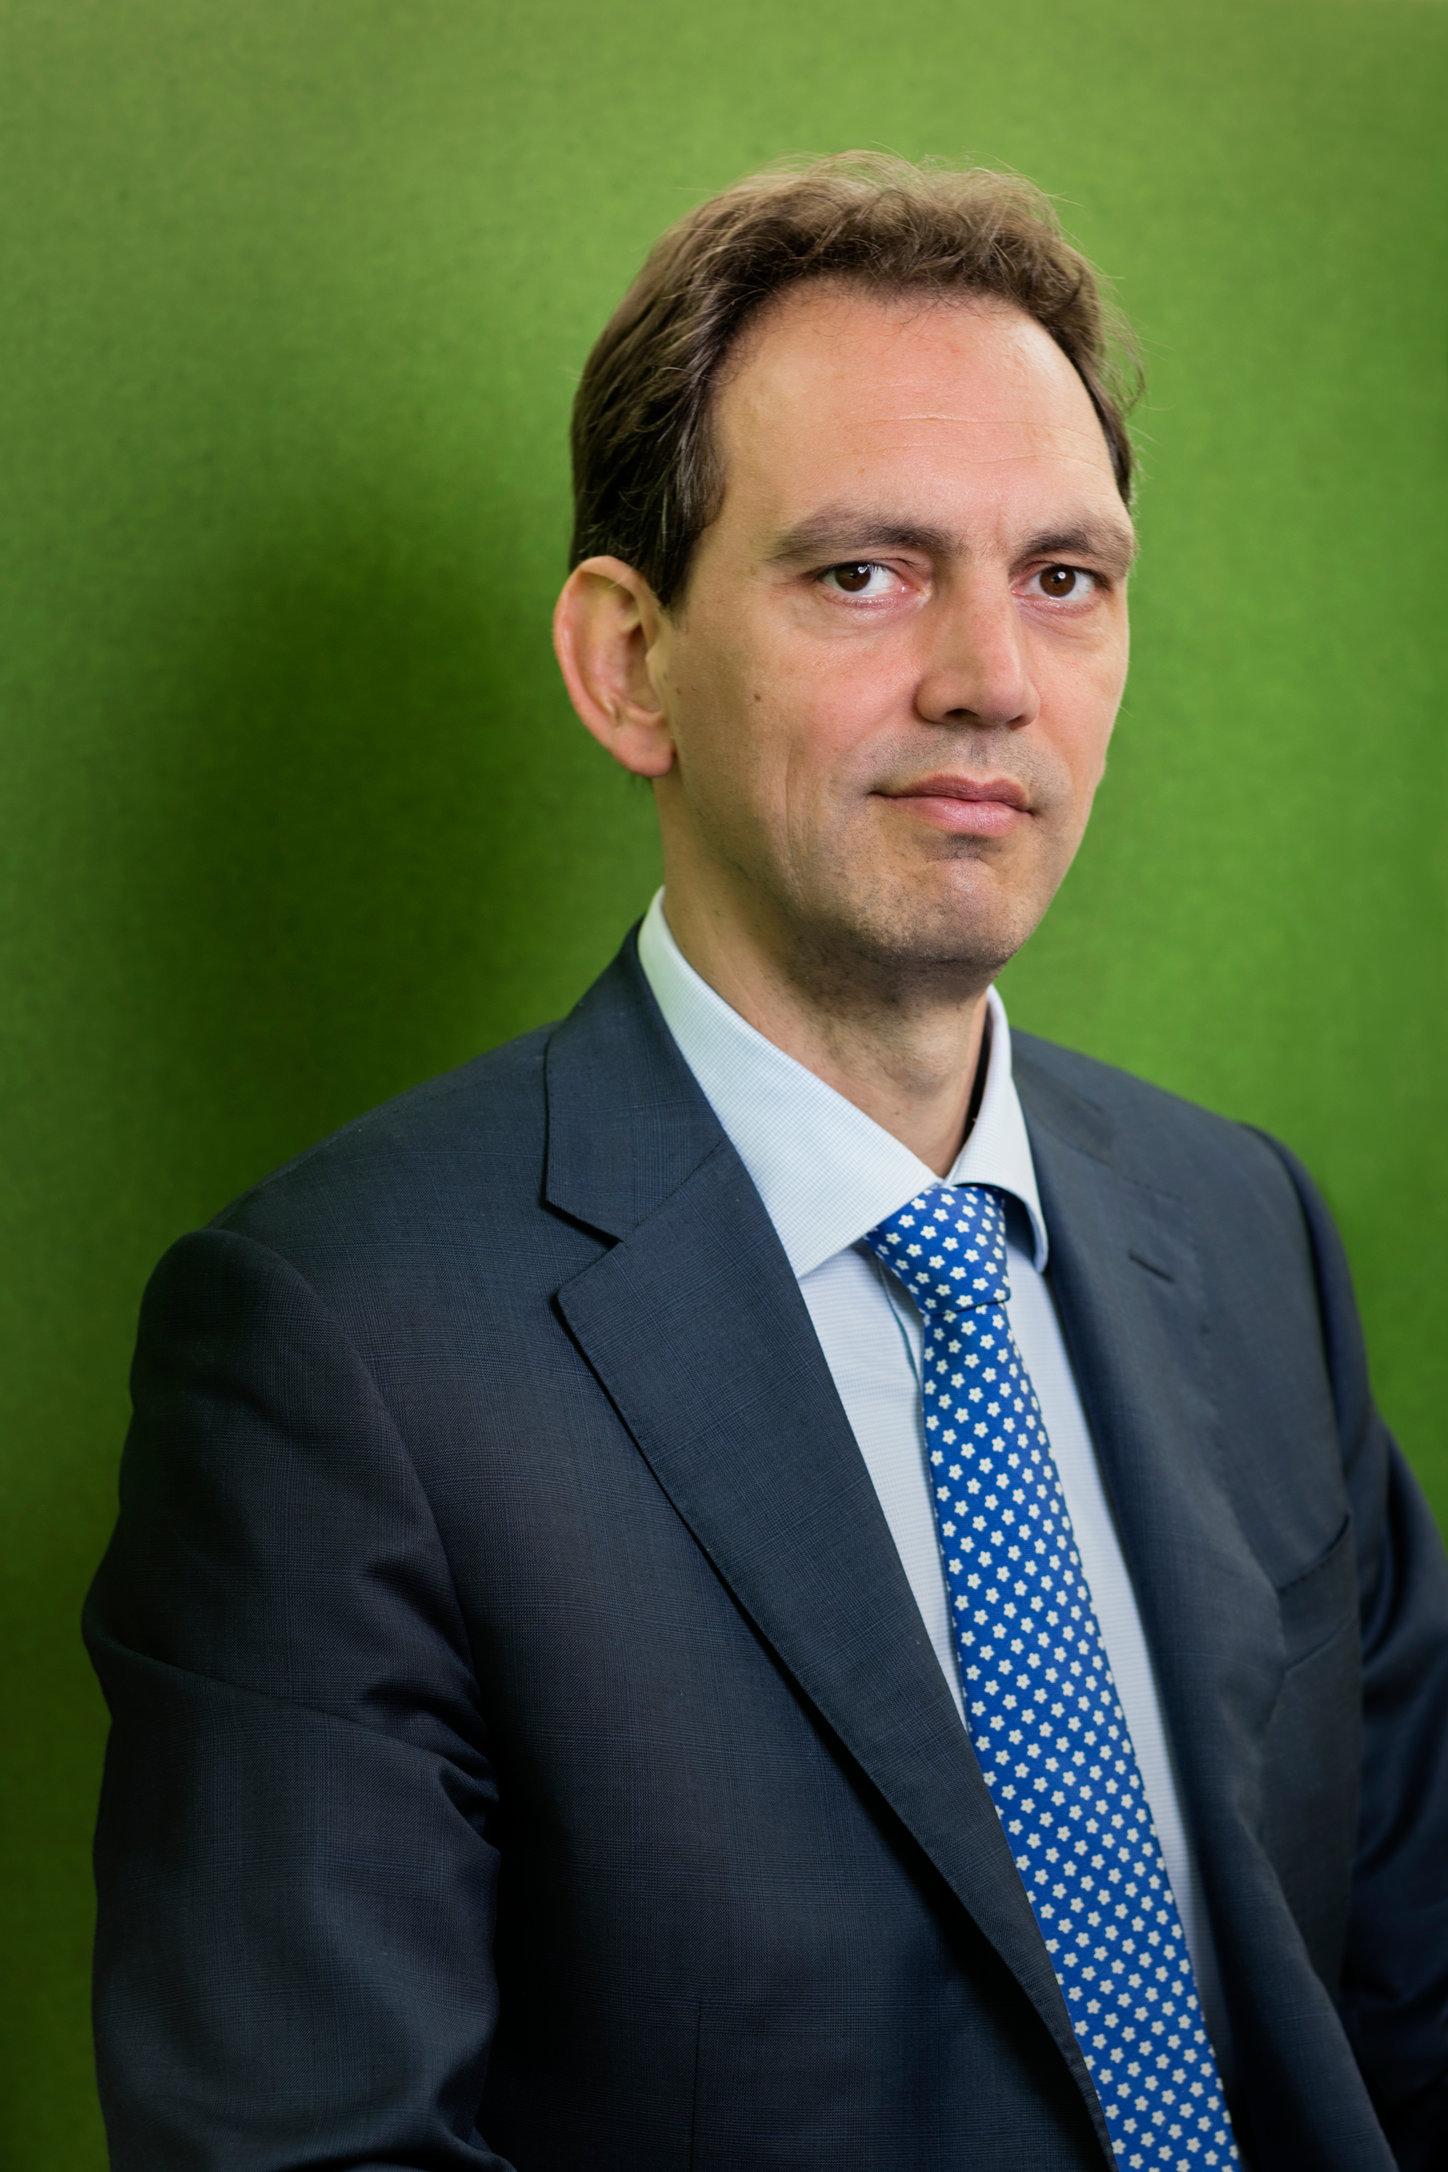 Frank Meijer for Financial Investigator